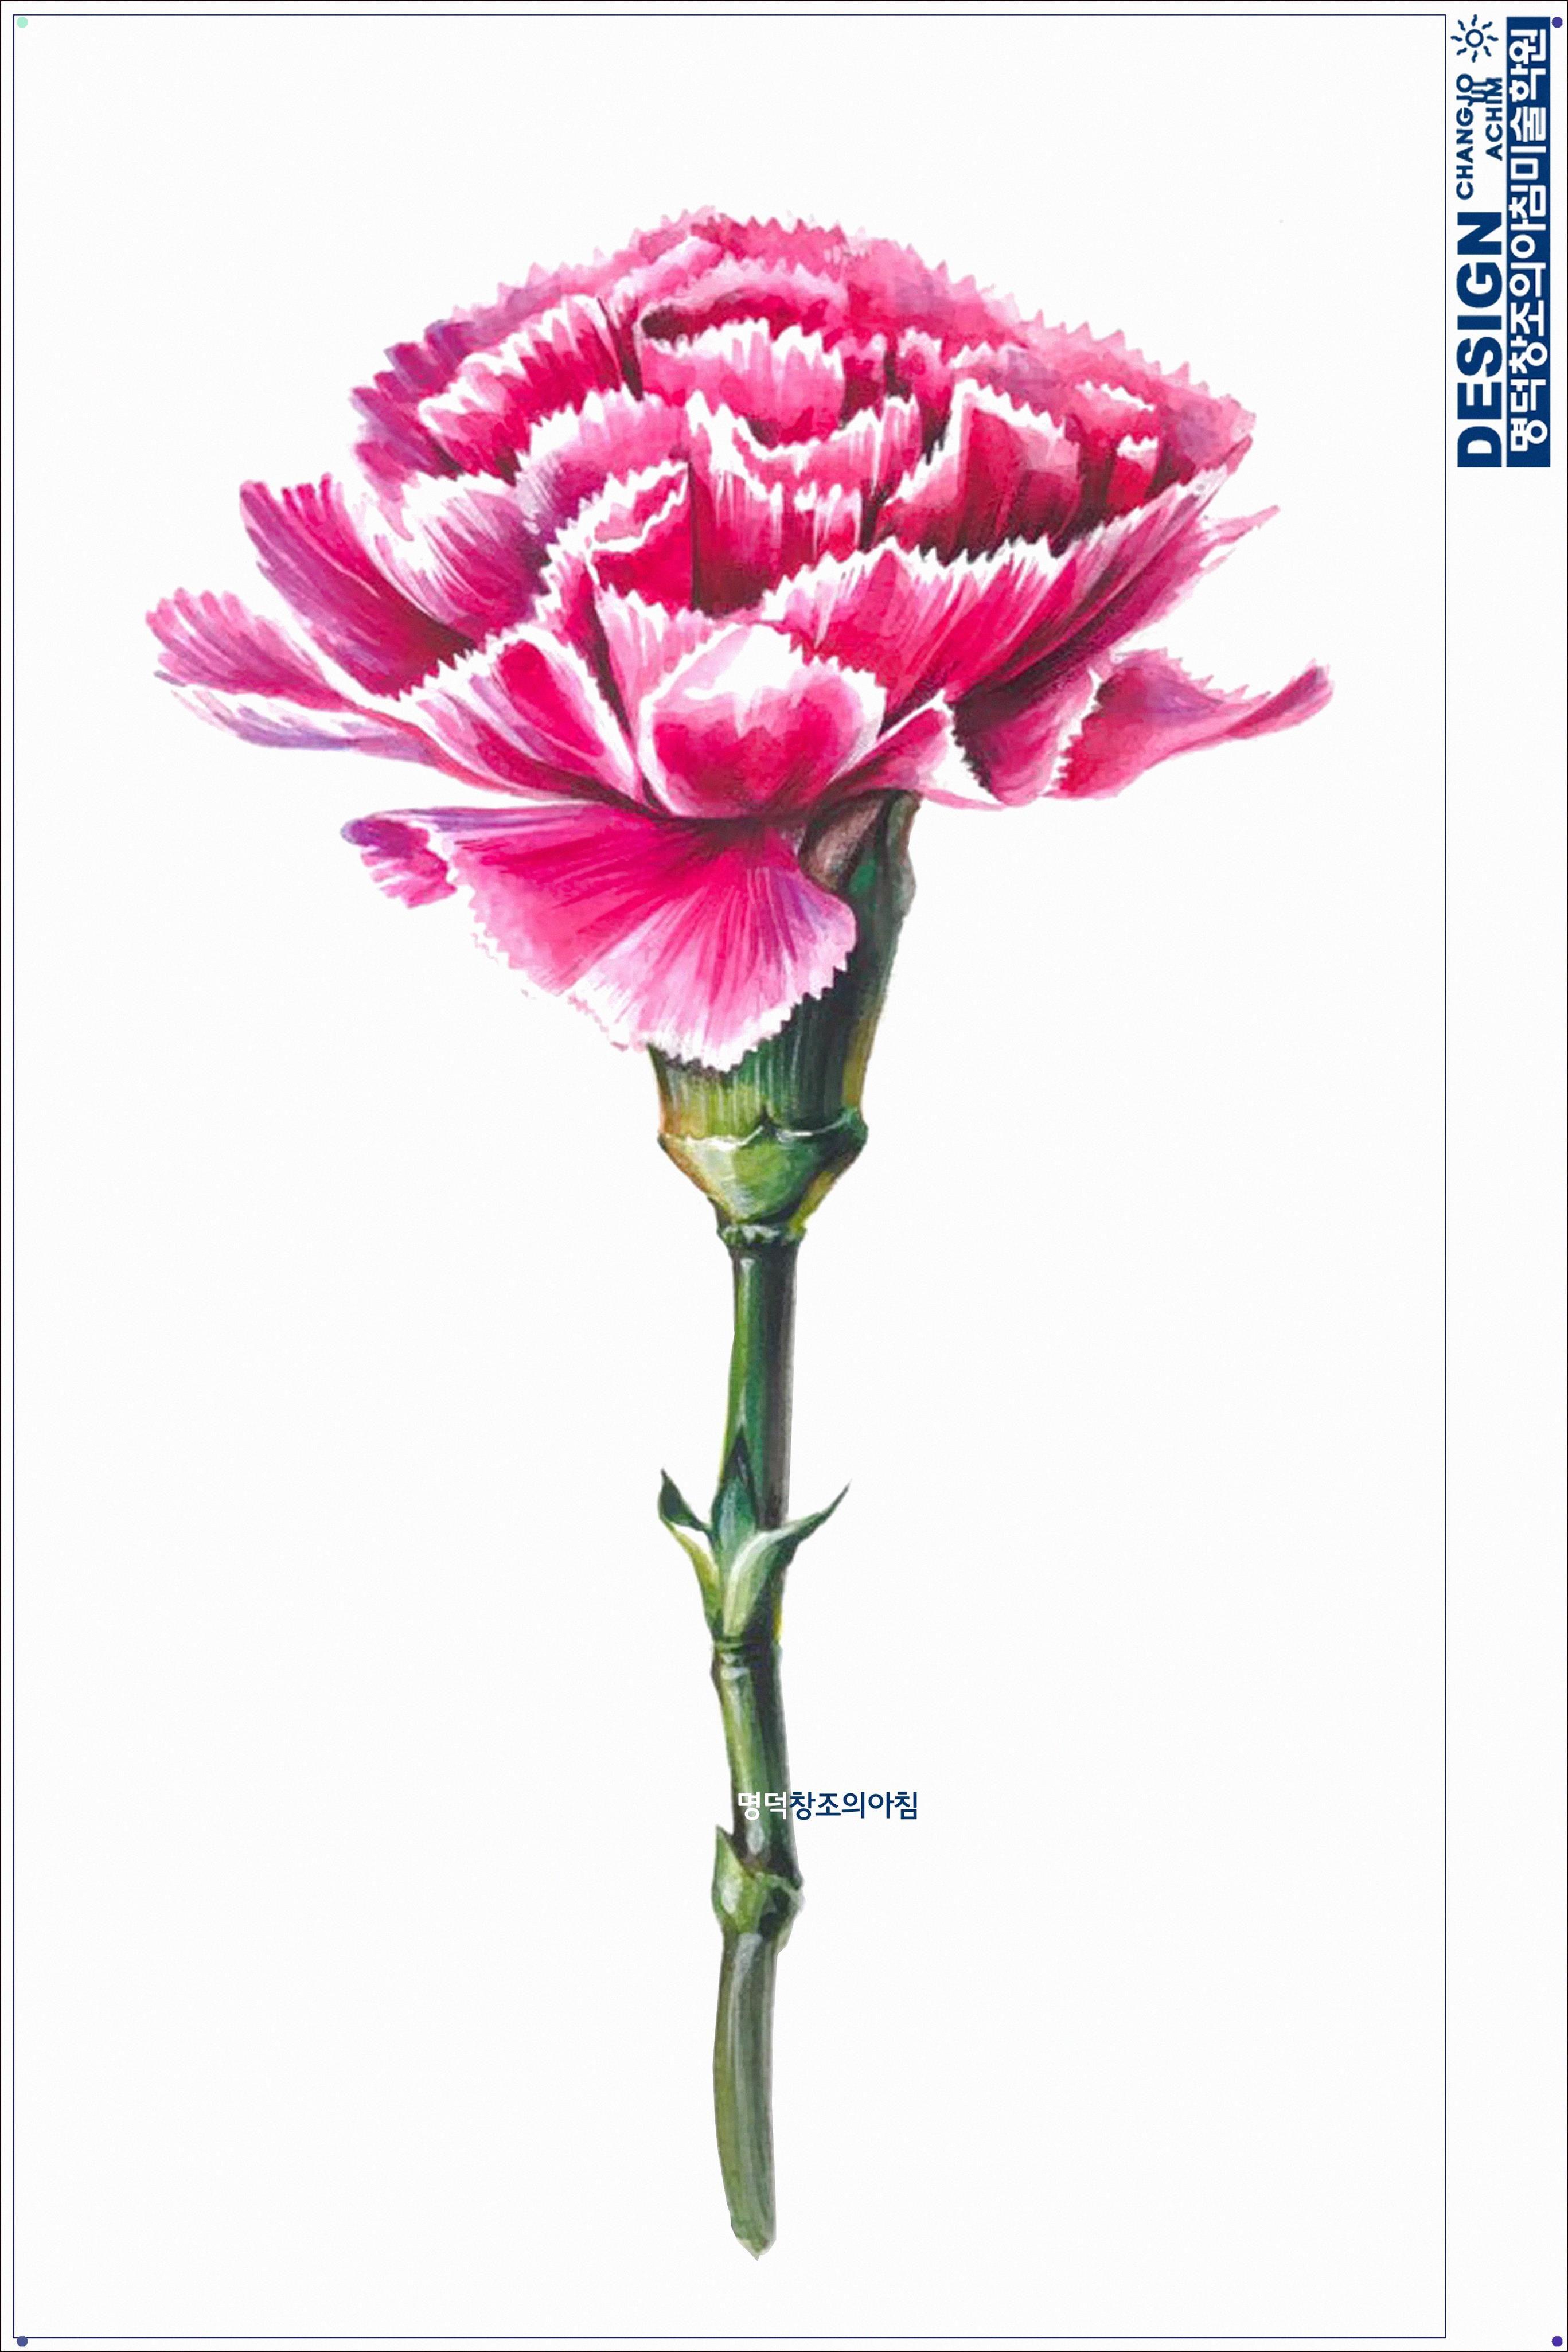 Carnation In 2020 Flower Drawing Flower Art Pencil Drawings Of Flowers